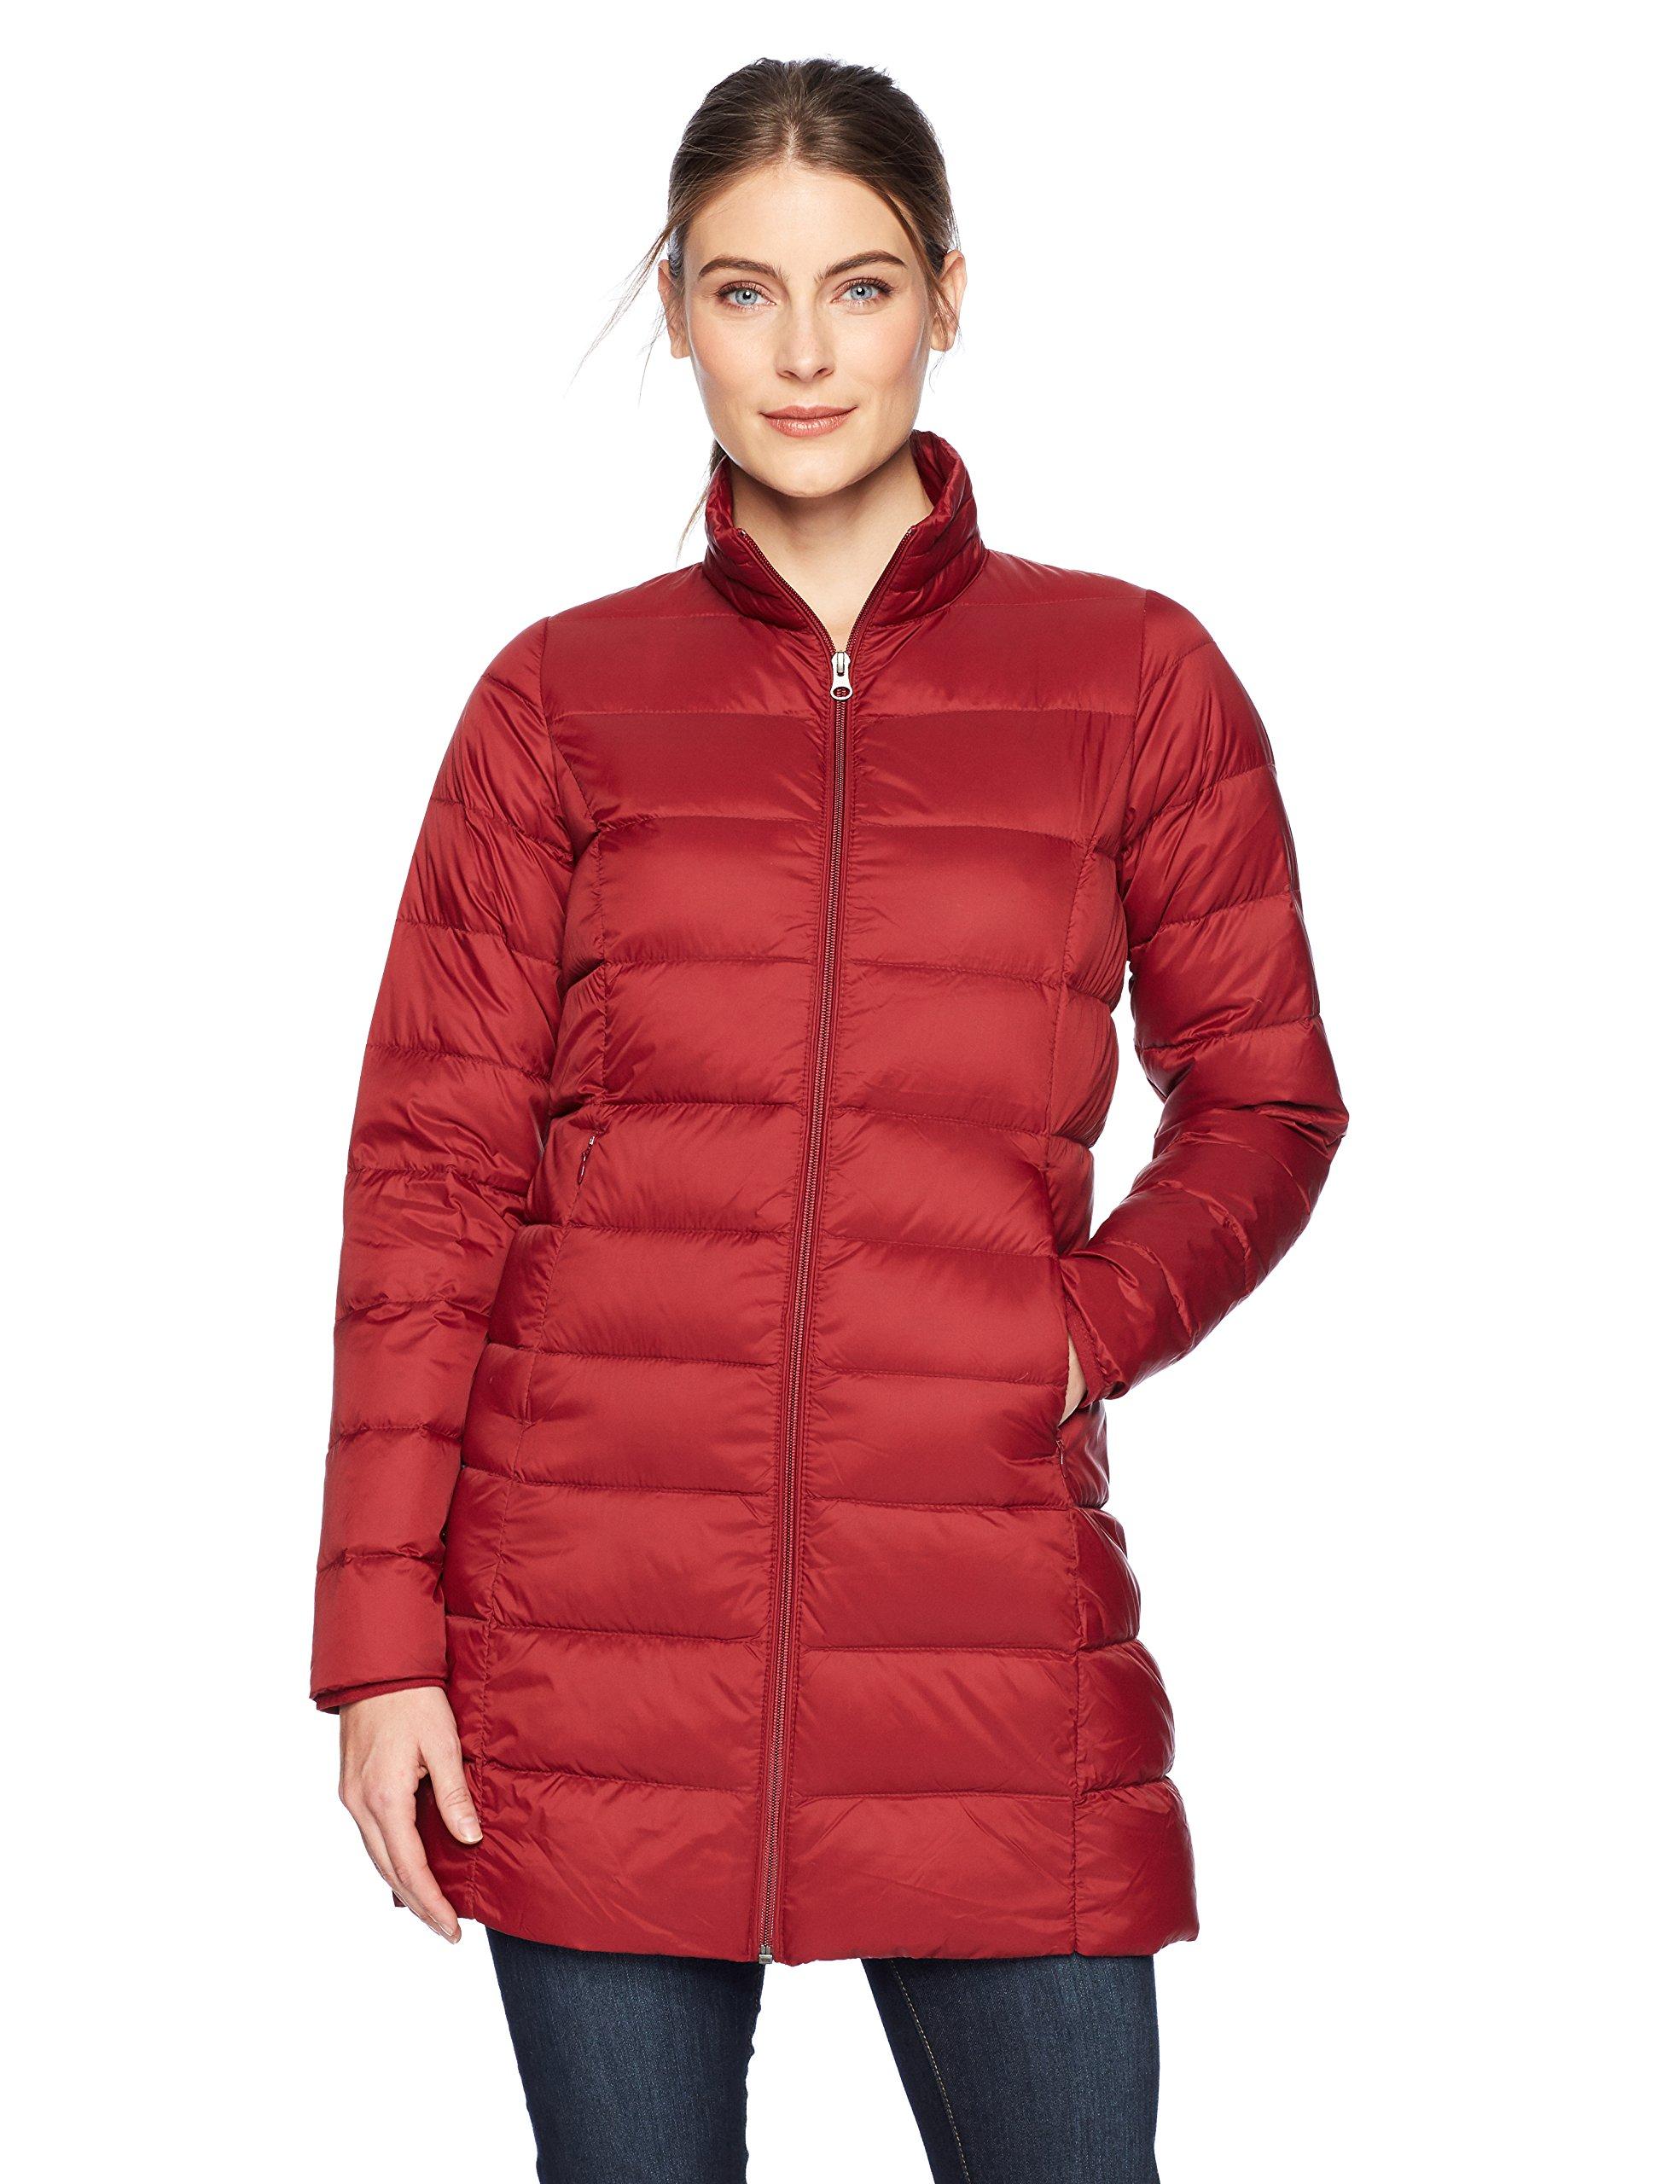 Amazon Essentials Women's Lightweight Water-Resistant Packable Down Coat, Red Rust, Large